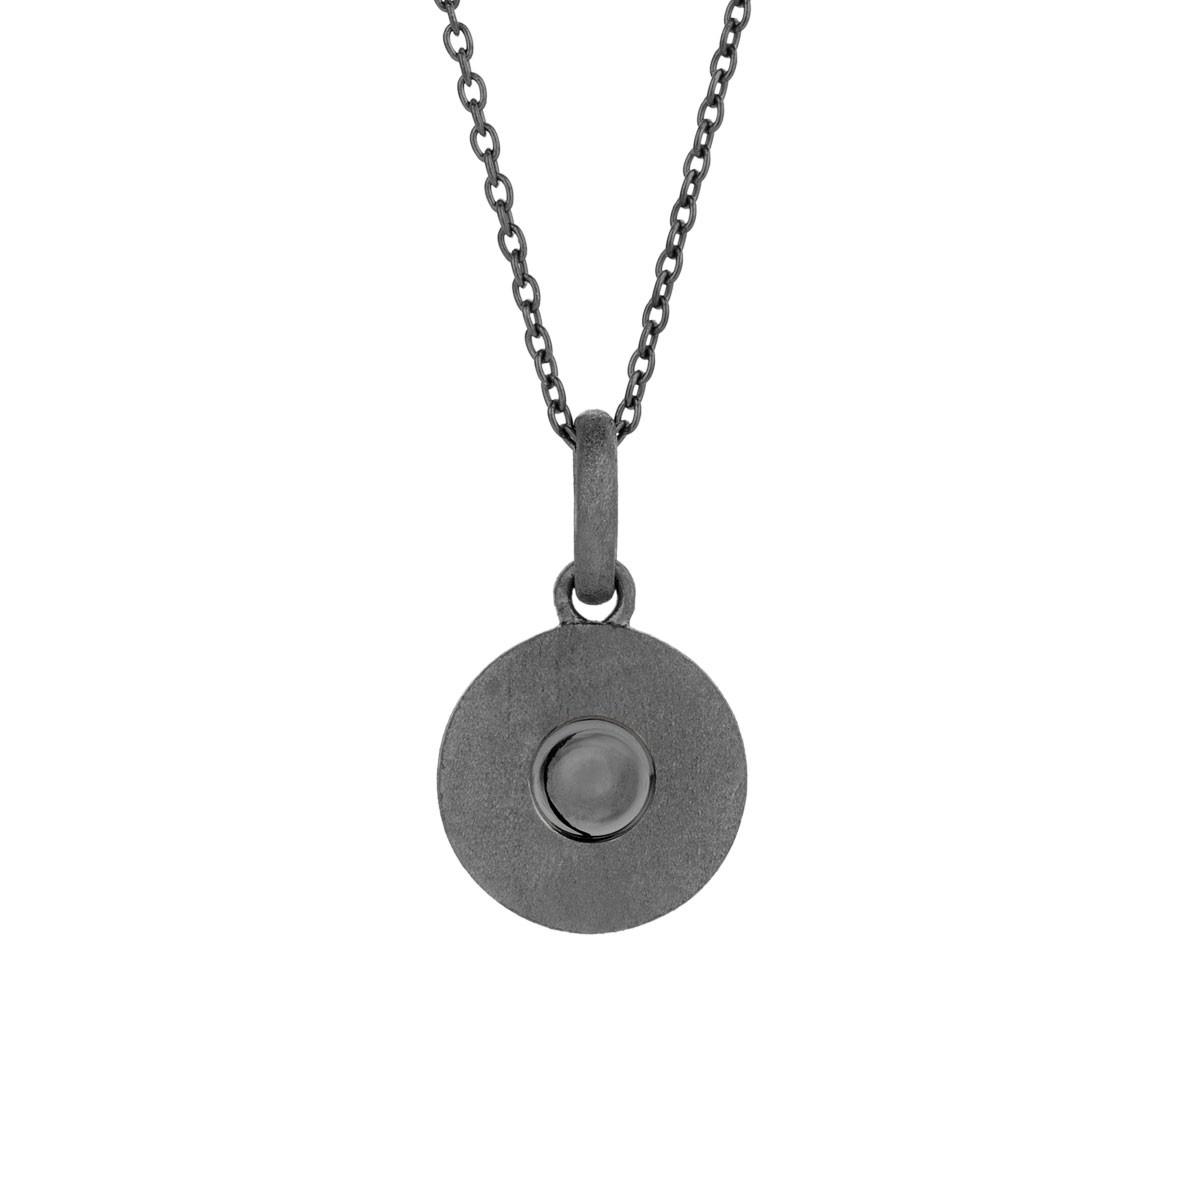 Raw Sølv Halskæde fra Spirit Icons S10313-45